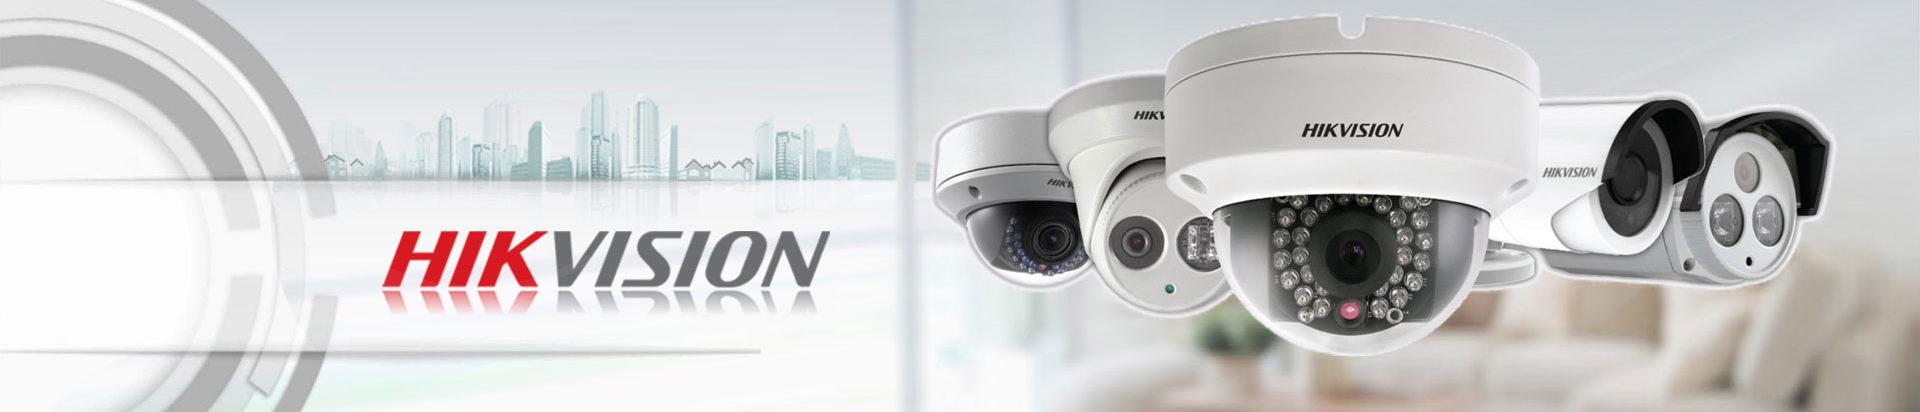 Sky-Net Systemy Alarmowe, Automatyka, Monitoring, instalacje TV/SAT. Kamery IP